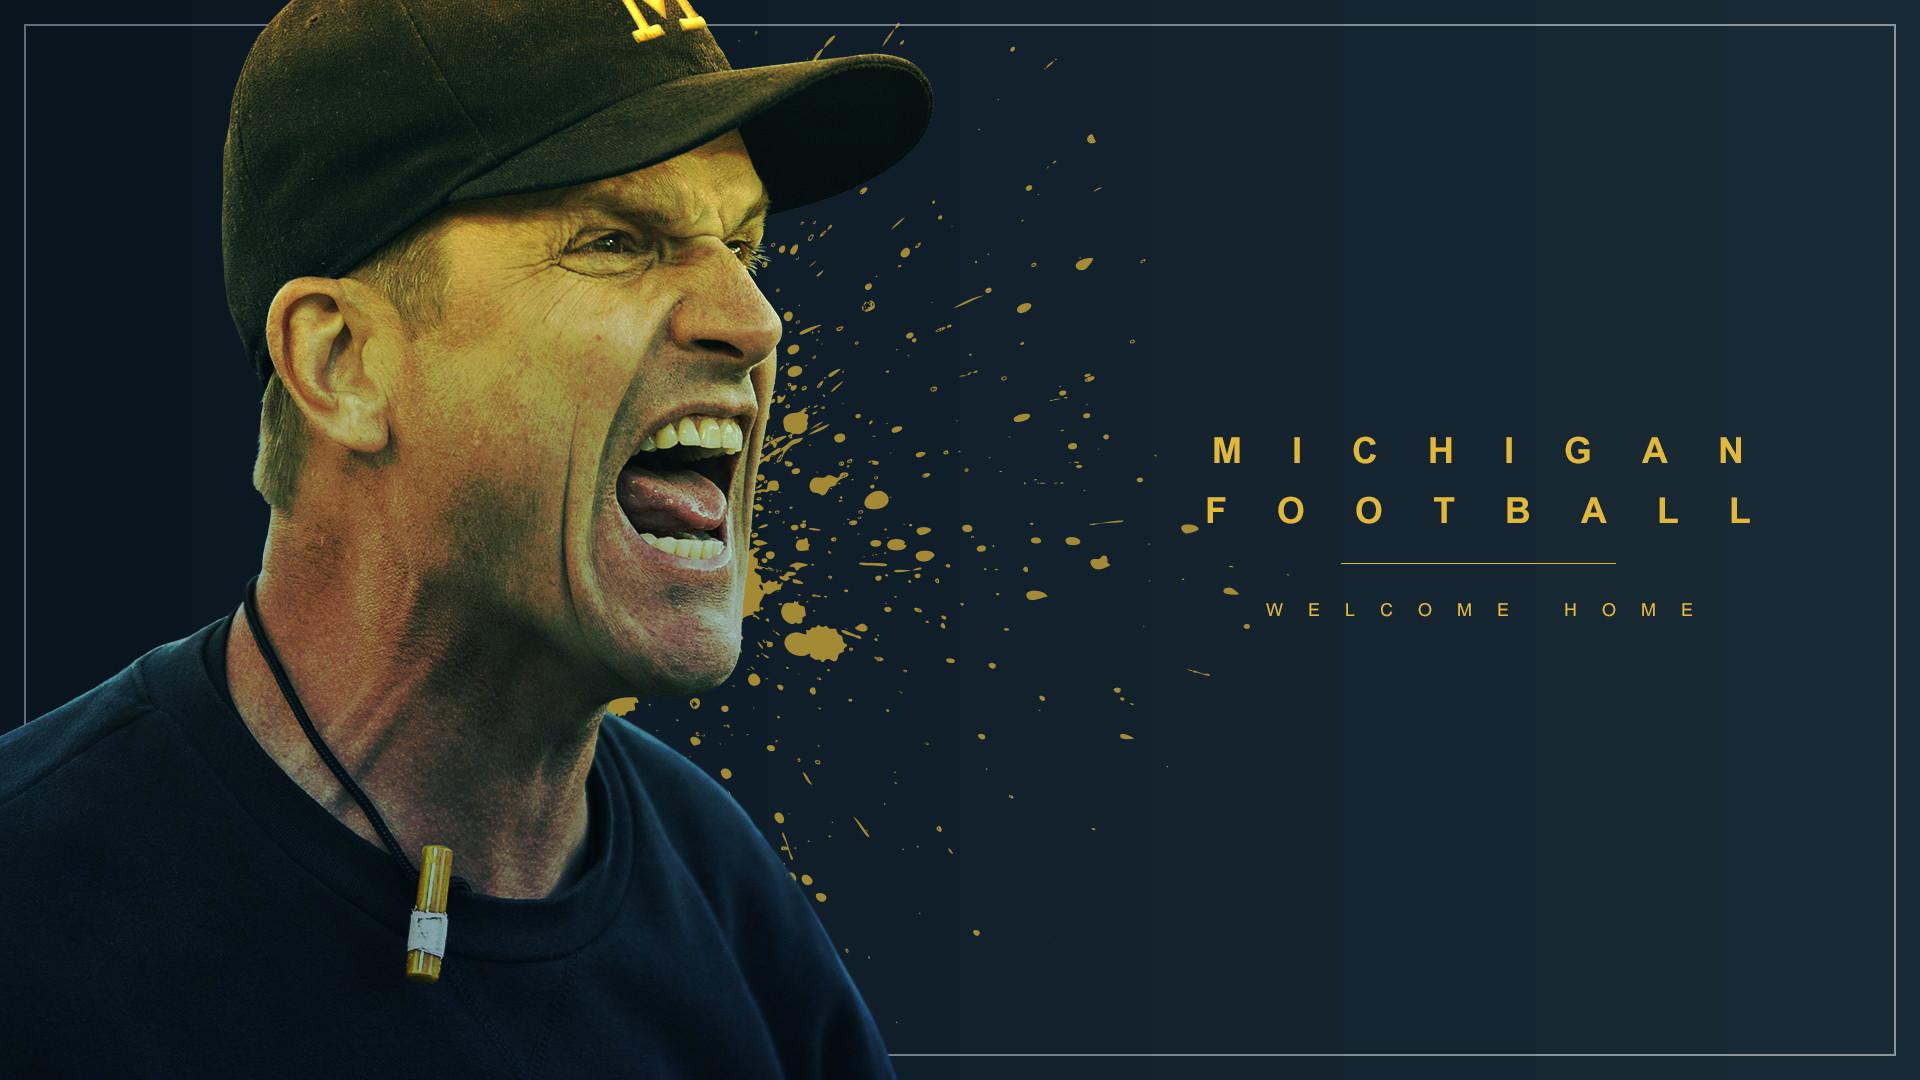 Michigan Football Wallpaper x | HD Wallpapers | Pinterest | Football  wallpaper and Wallpaper